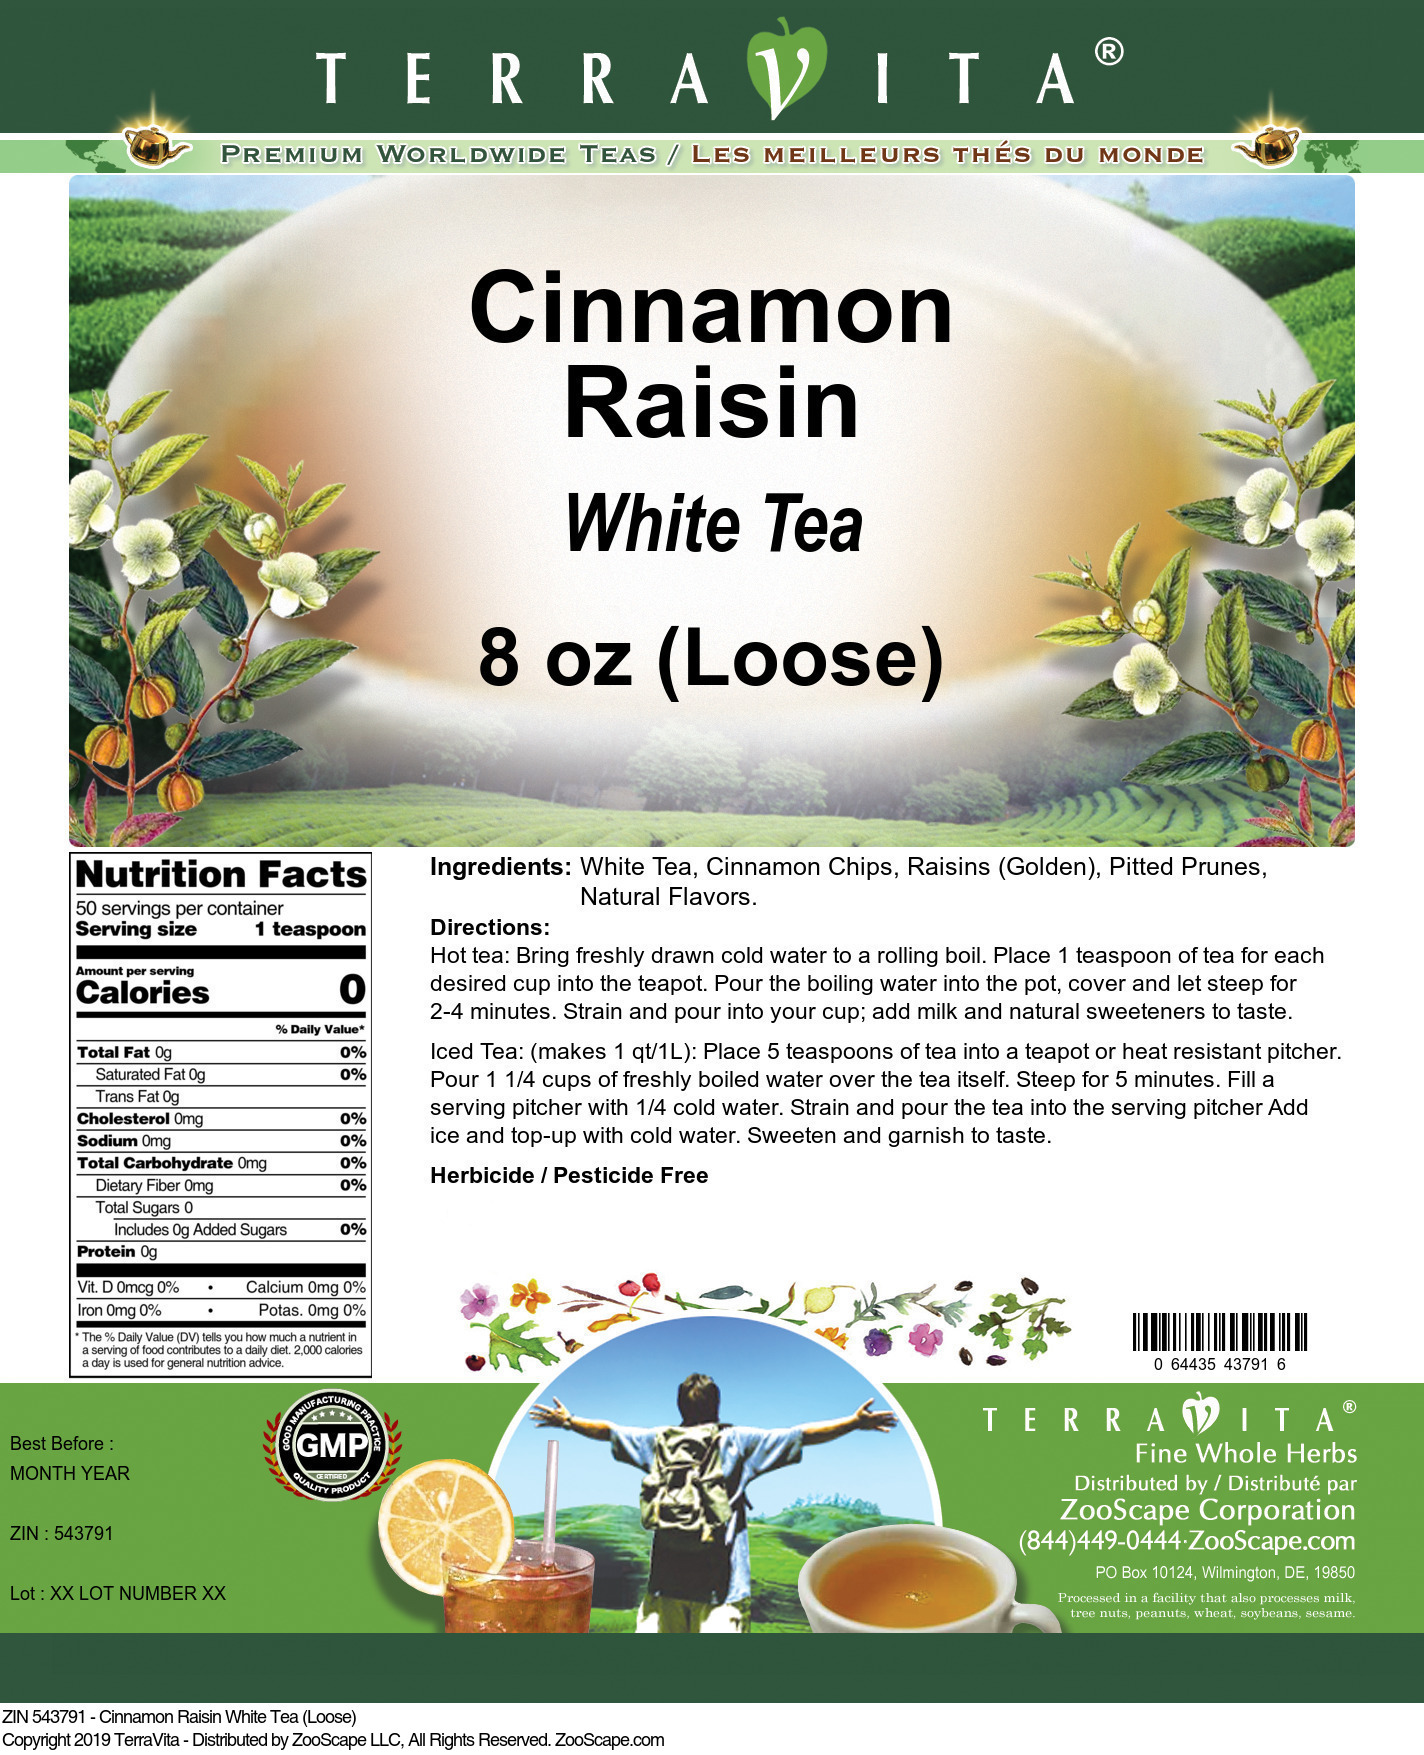 Cinnamon Raisin White Tea (Loose)